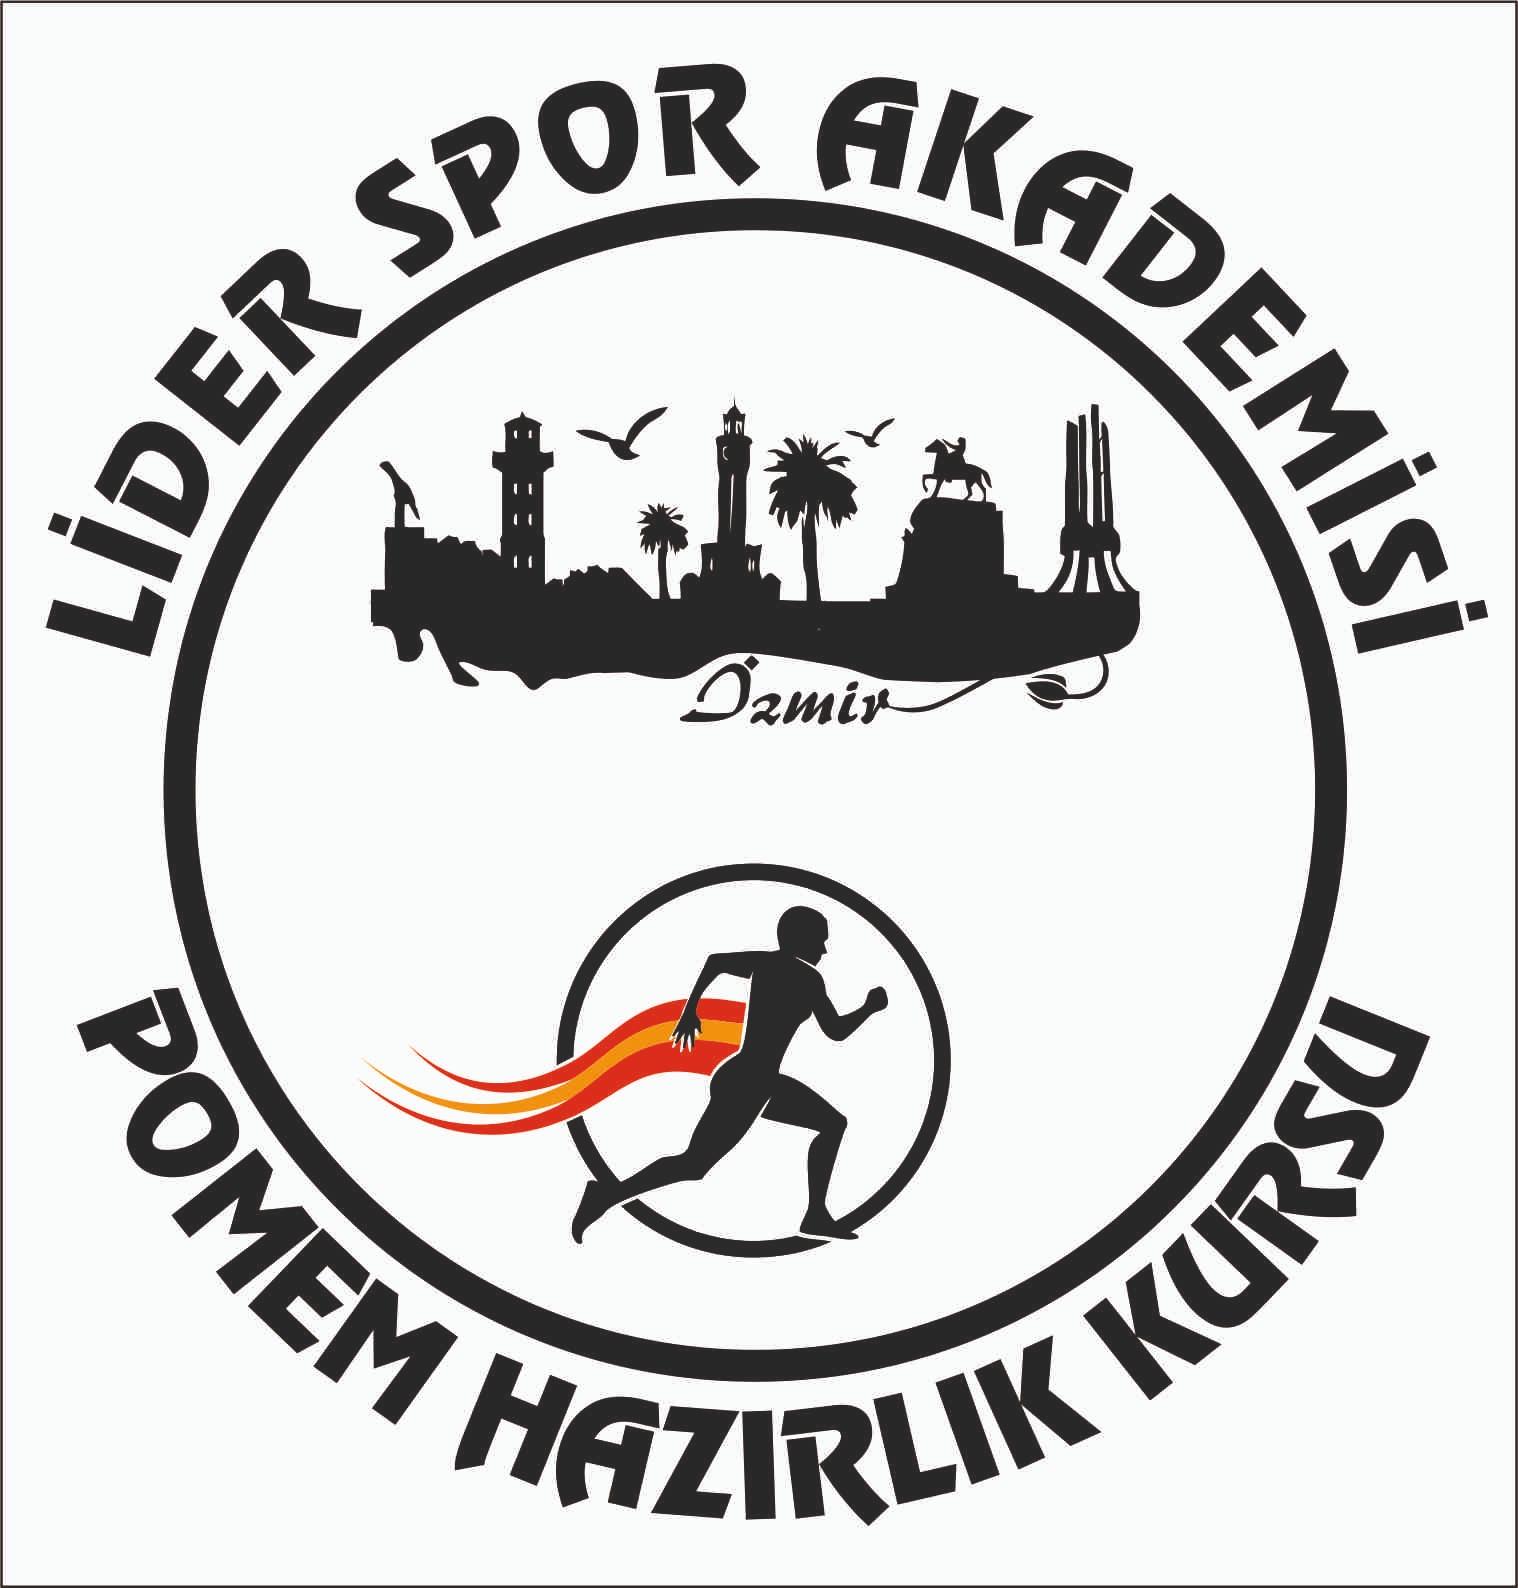 İzmir Lider Akademi Pomem Pmyo Bekçi Parkur Hazırlık Kursu